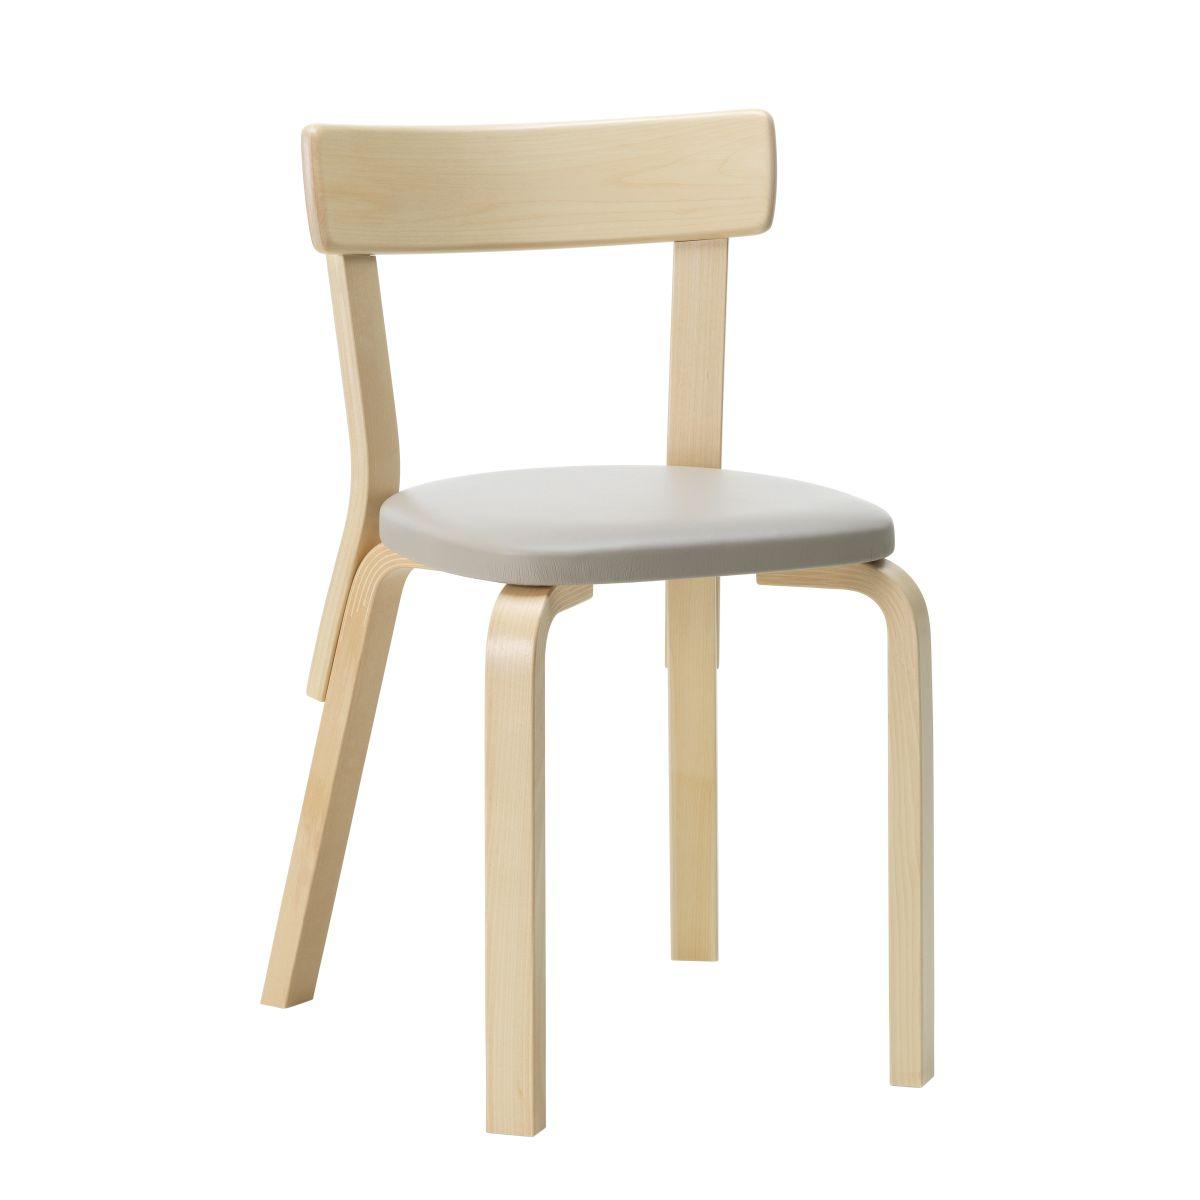 Chair 69 natural/ upholstery Sörensen Prestige beige_F